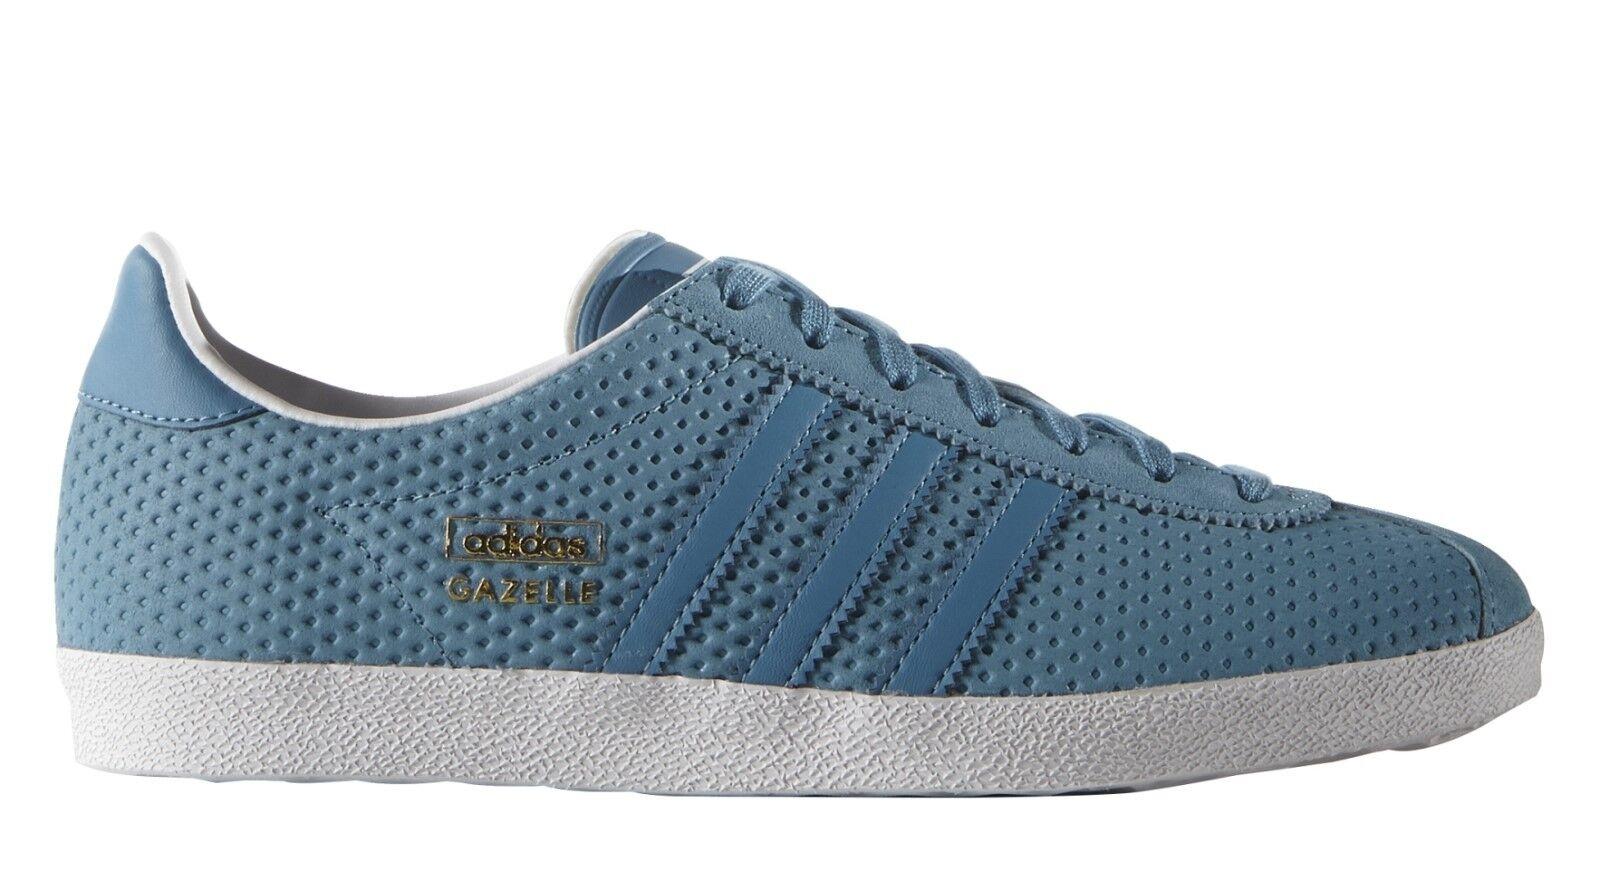 adidas Originals Schuhe NEU S78880 Gazelle Damenschuhe Turnschuhe Petrol Blau